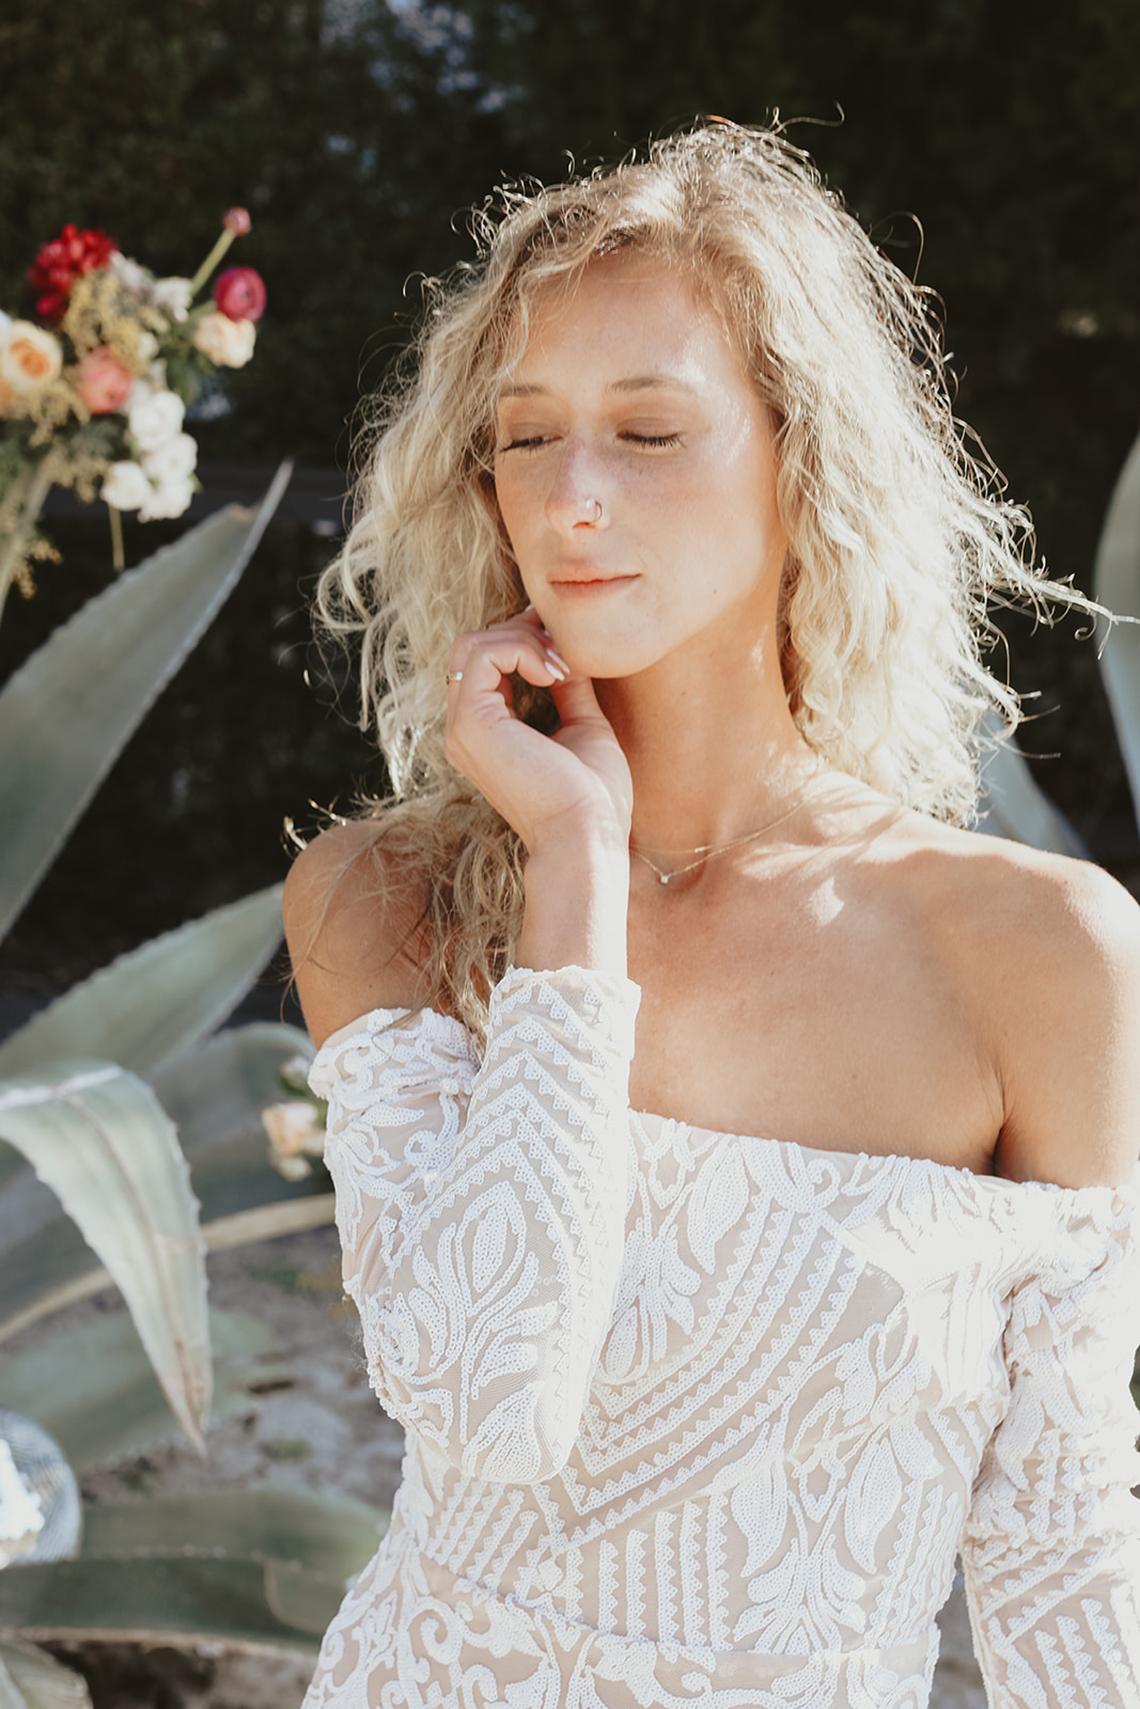 Bohemian Beach Wedding Inspiration With Agave Decor – Georgia Grace – Salt and Stem 38